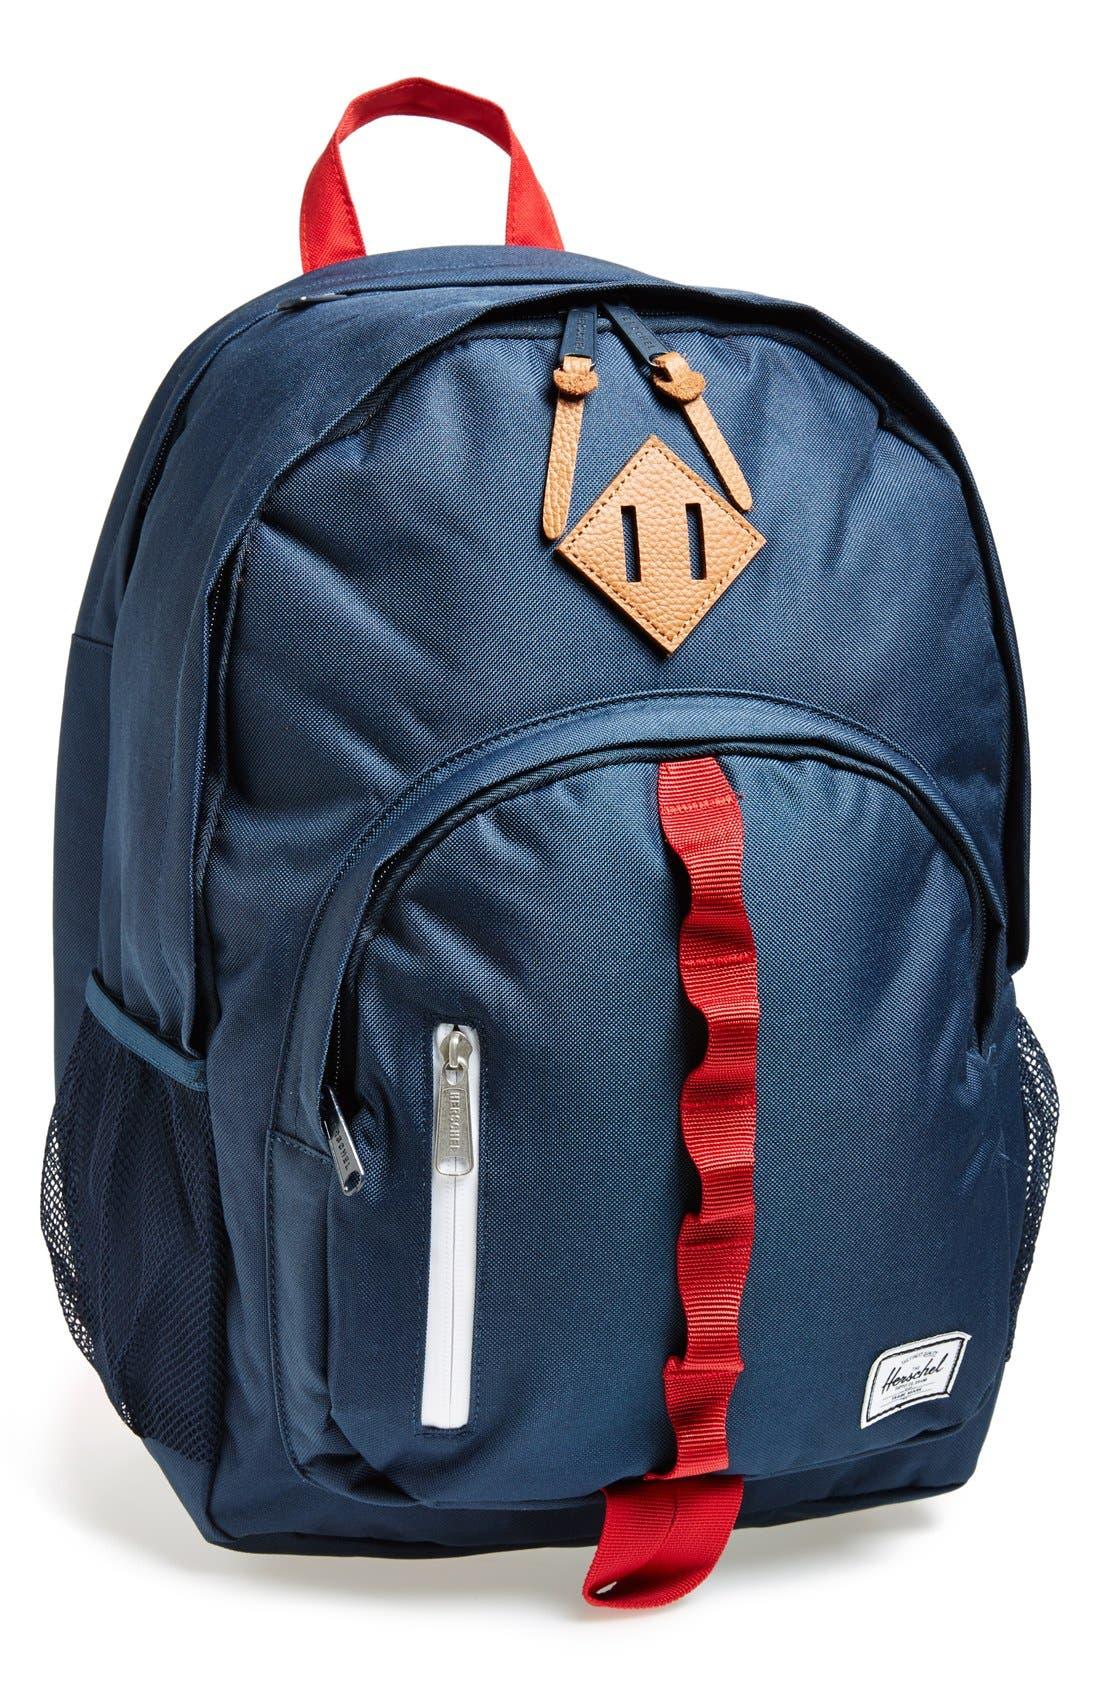 Main Image - Herschel Supply Co. 'Parkgate' Backpack